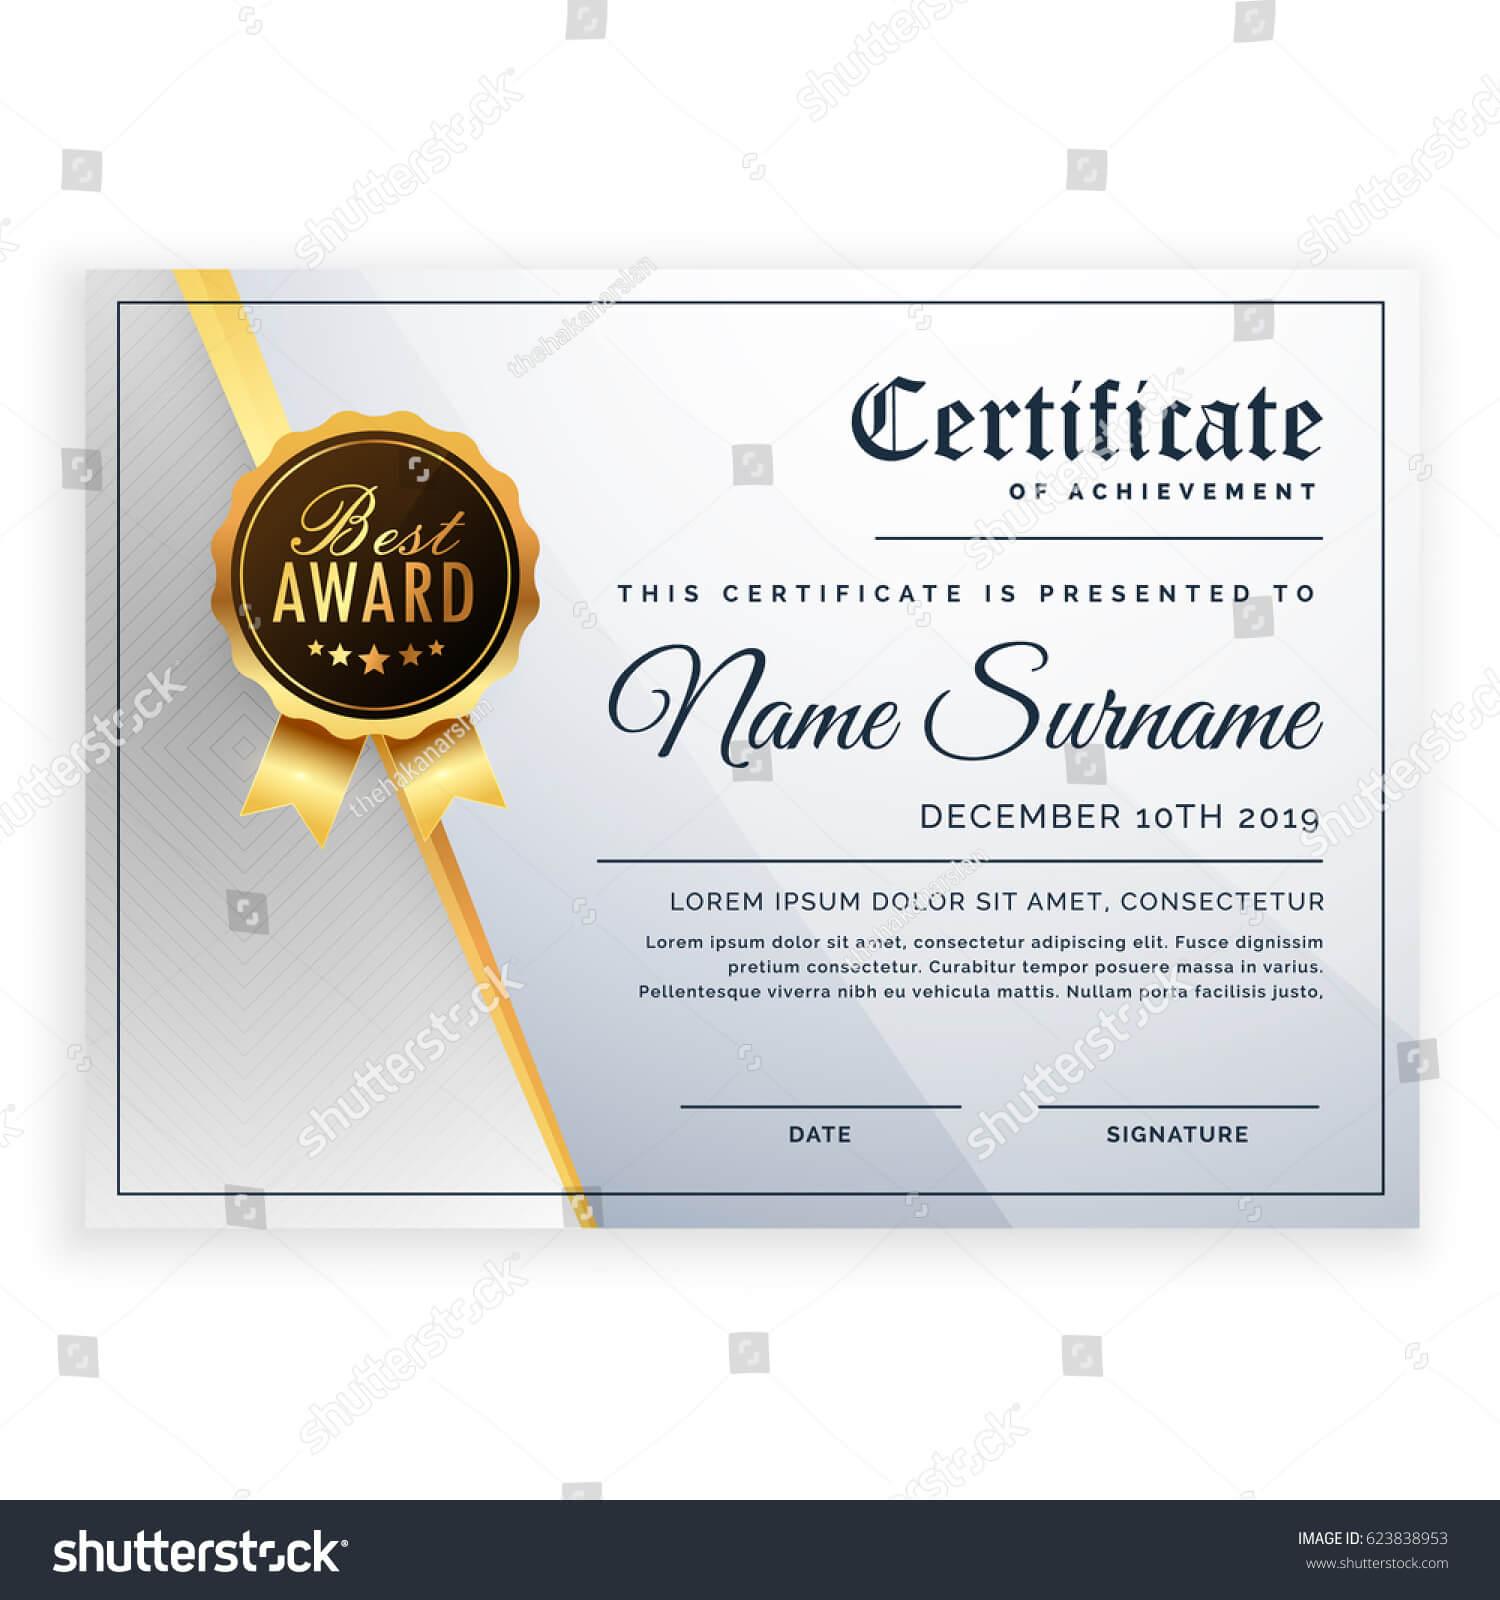 Vector Certificate Template Beautiful Certificate Template With Regard To Beautiful Certificate Templates